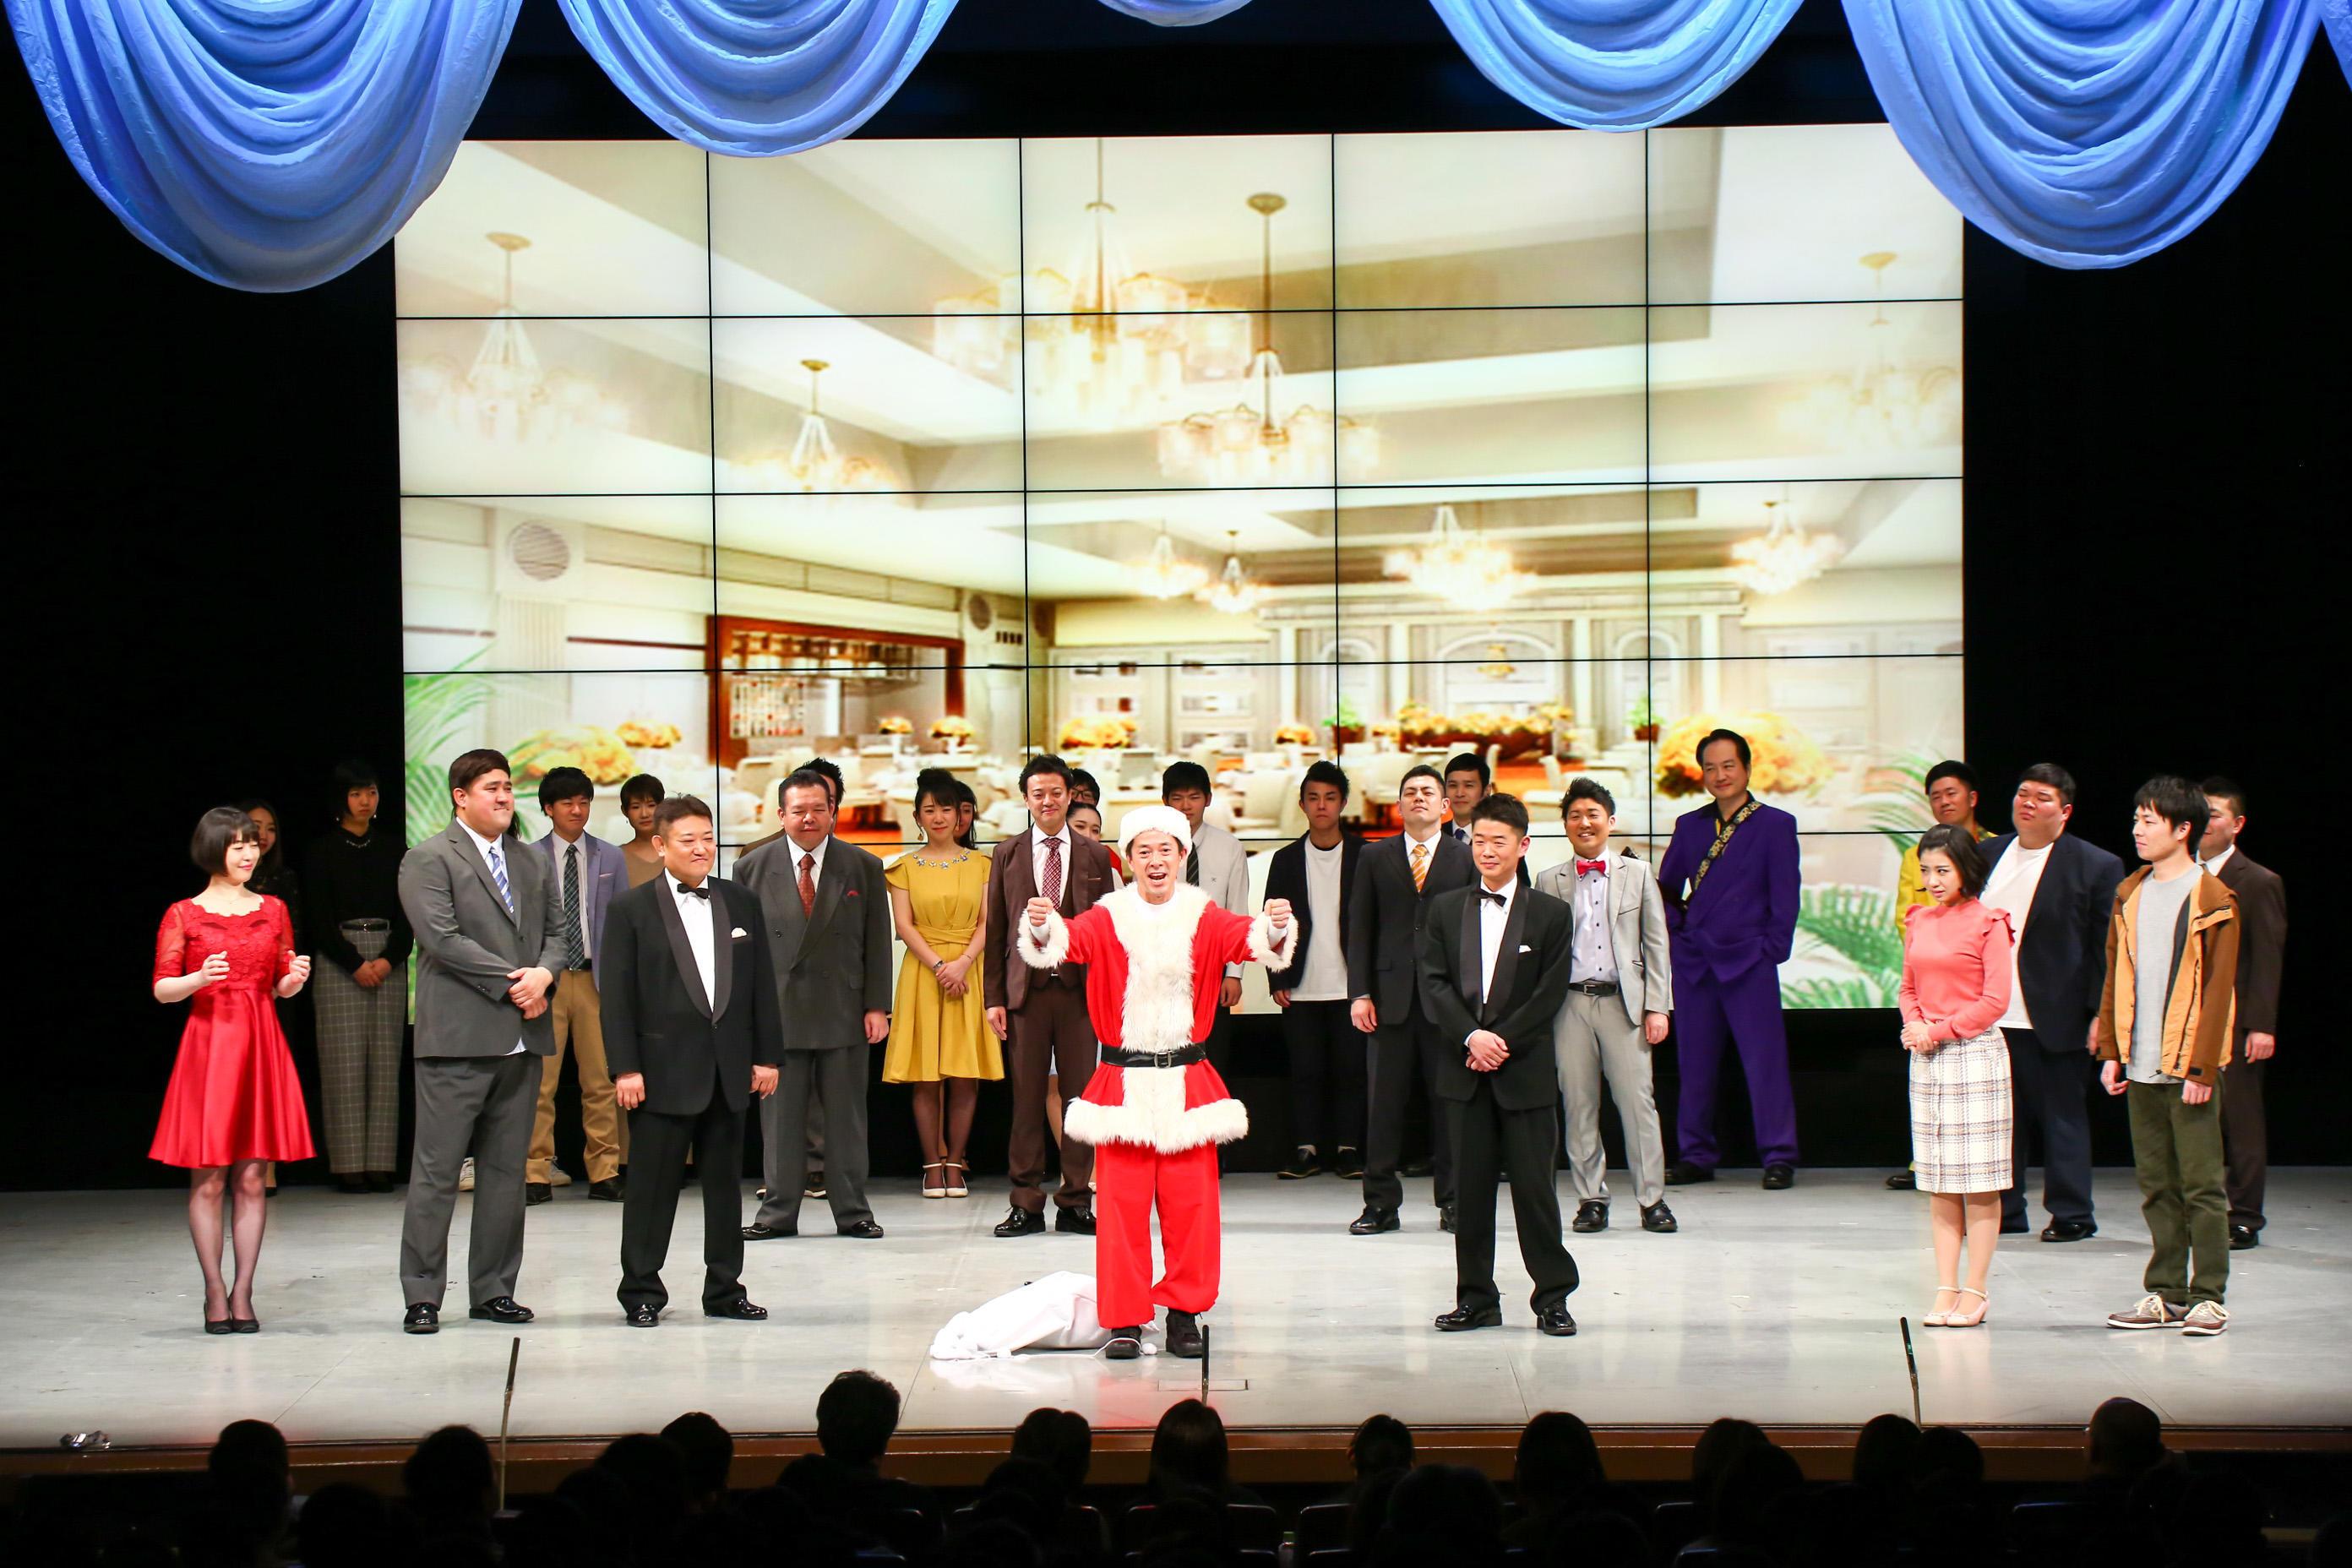 http://news.yoshimoto.co.jp/20190101033640-8dbb55e5f71af29a173bedfb85e2caedaa1976d3.jpg